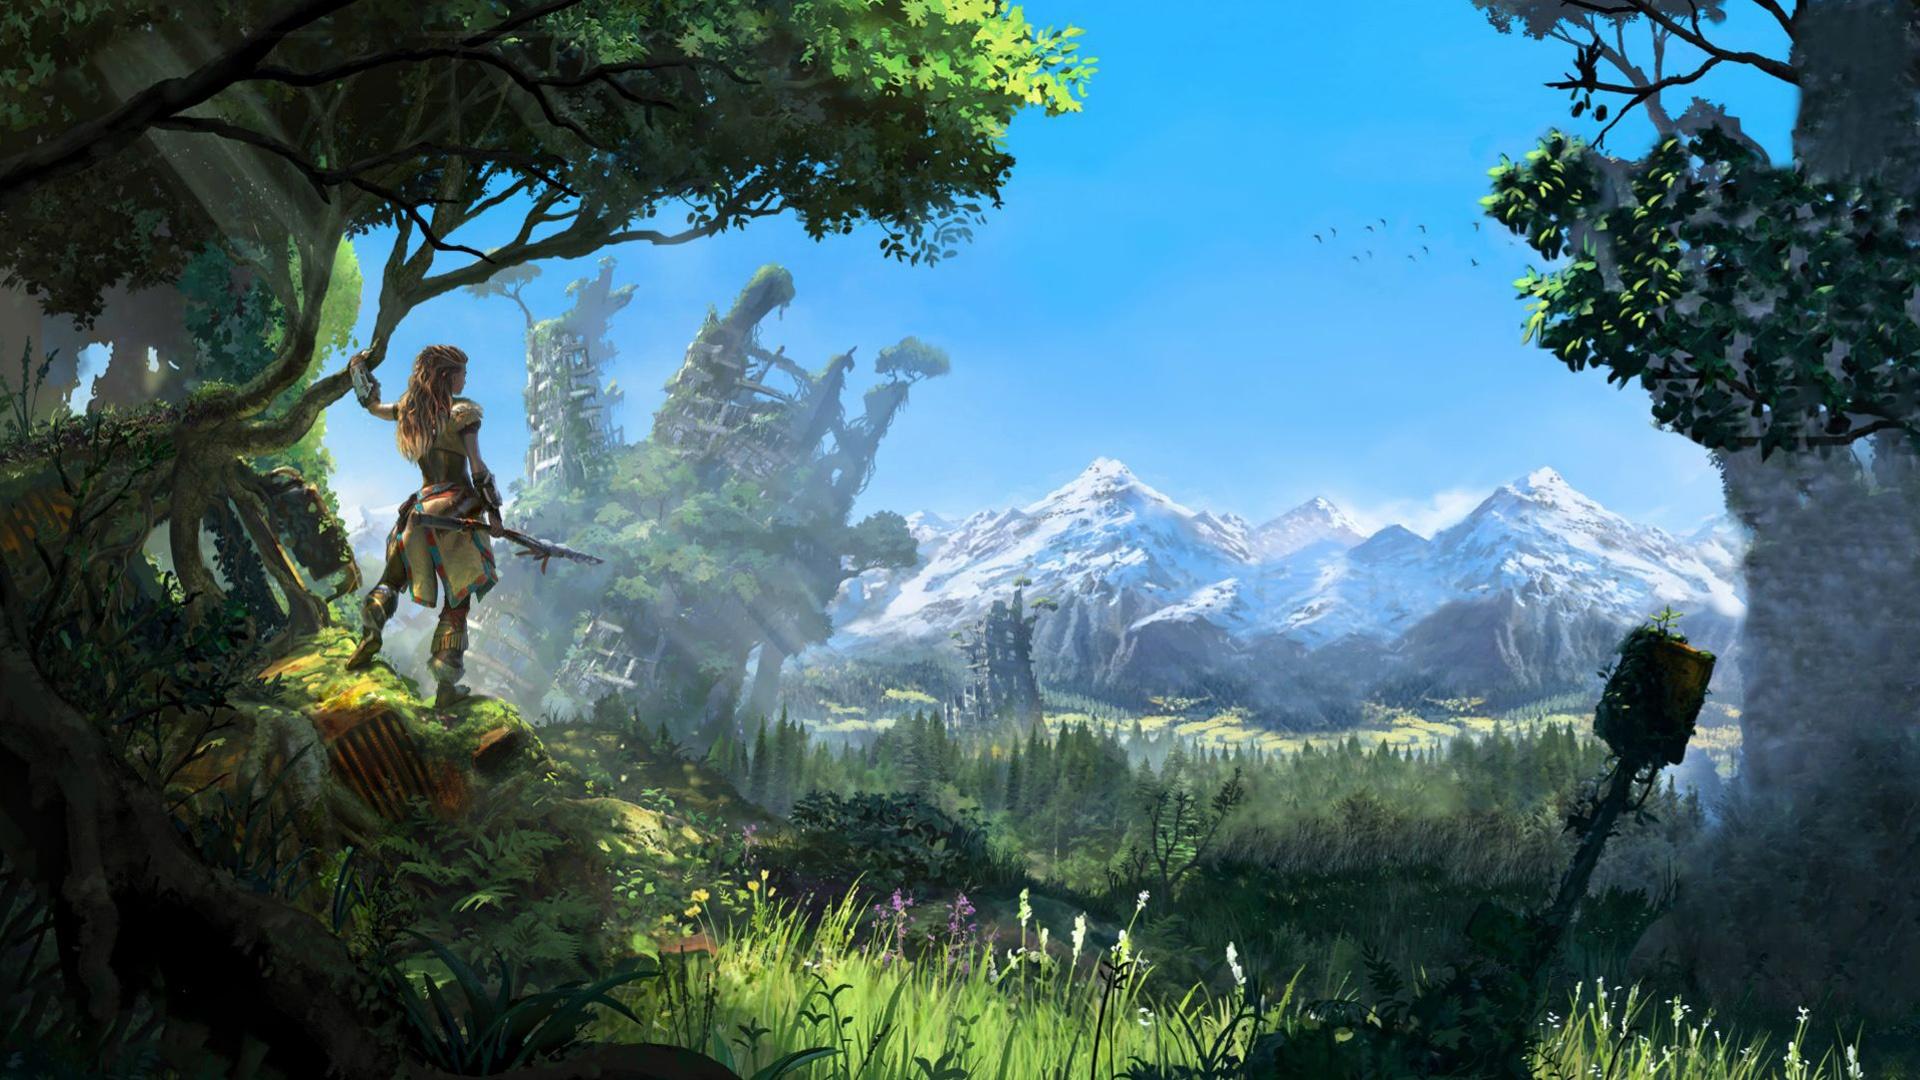 Horizon Zero Dawn 2016 Game Wallpapers In Jpg Format For Free Download